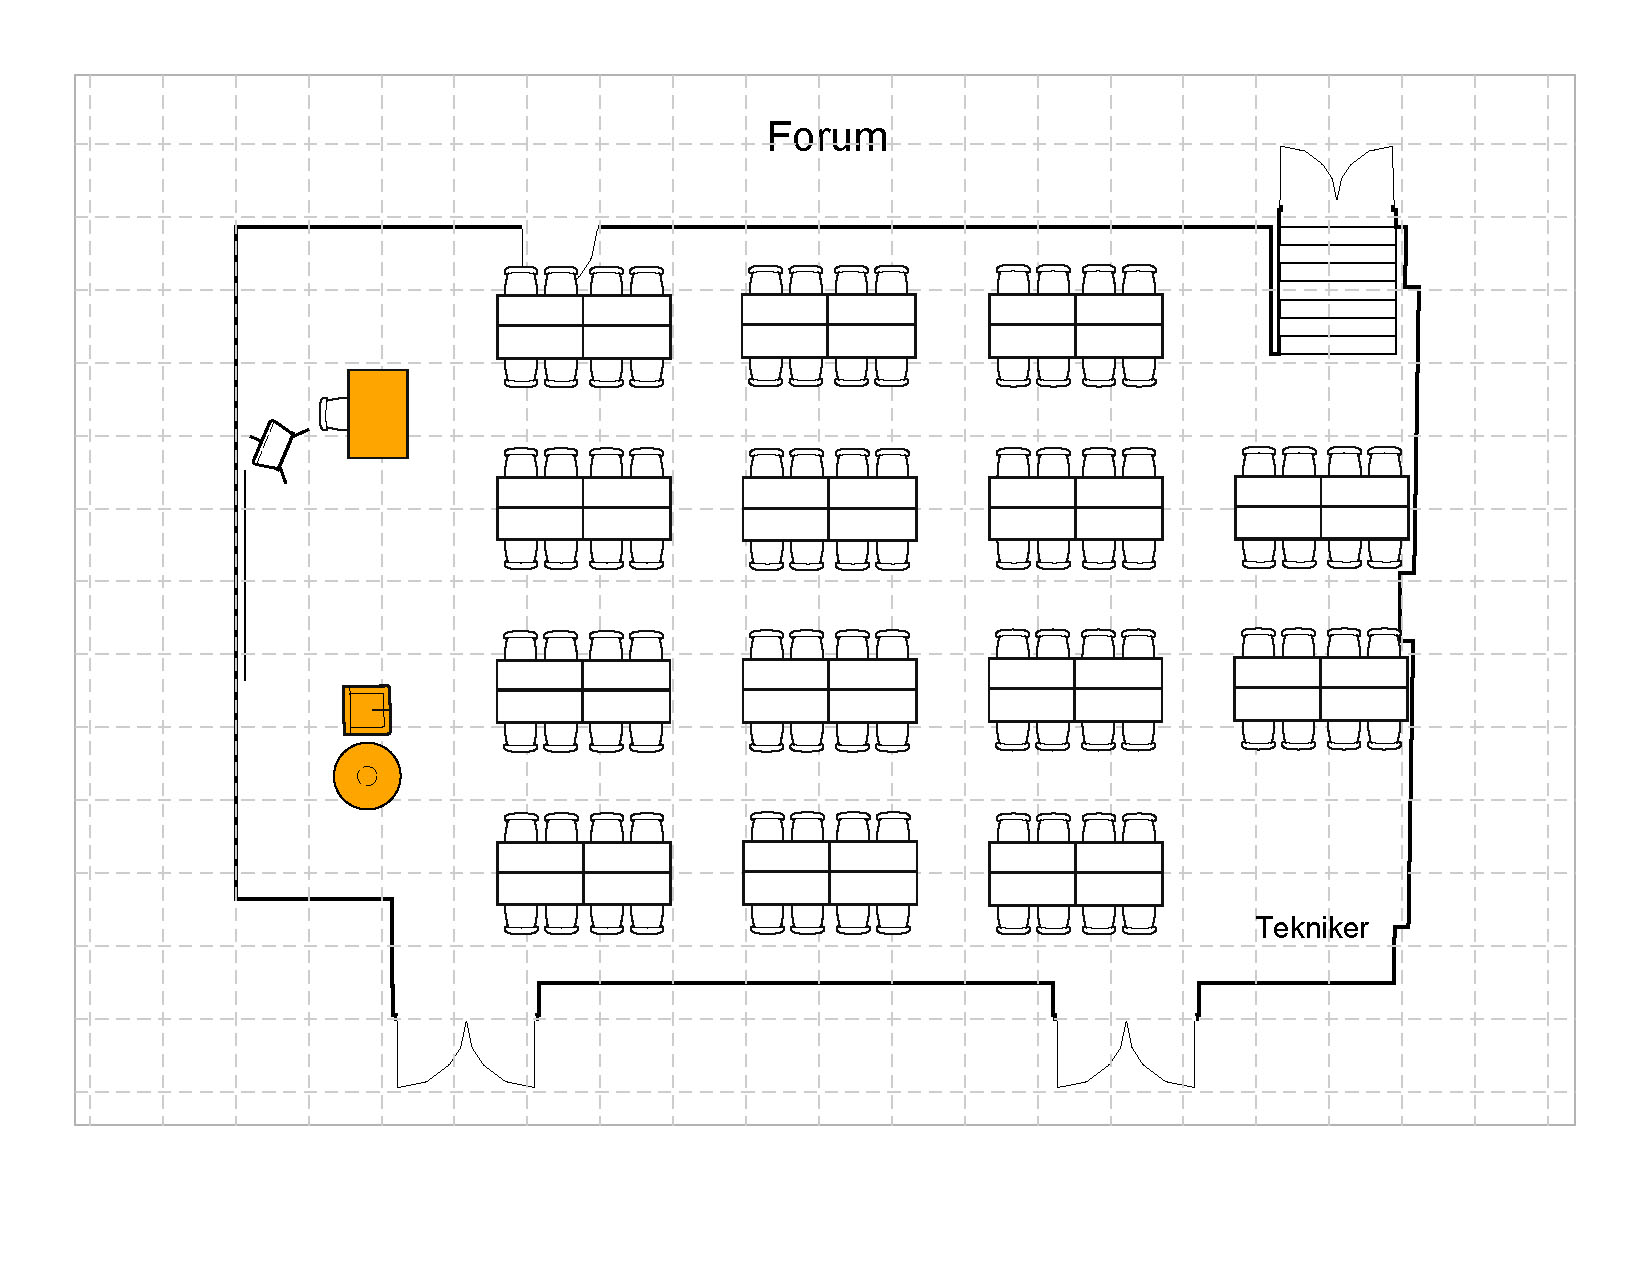 8 mannsbord, 112 plasser